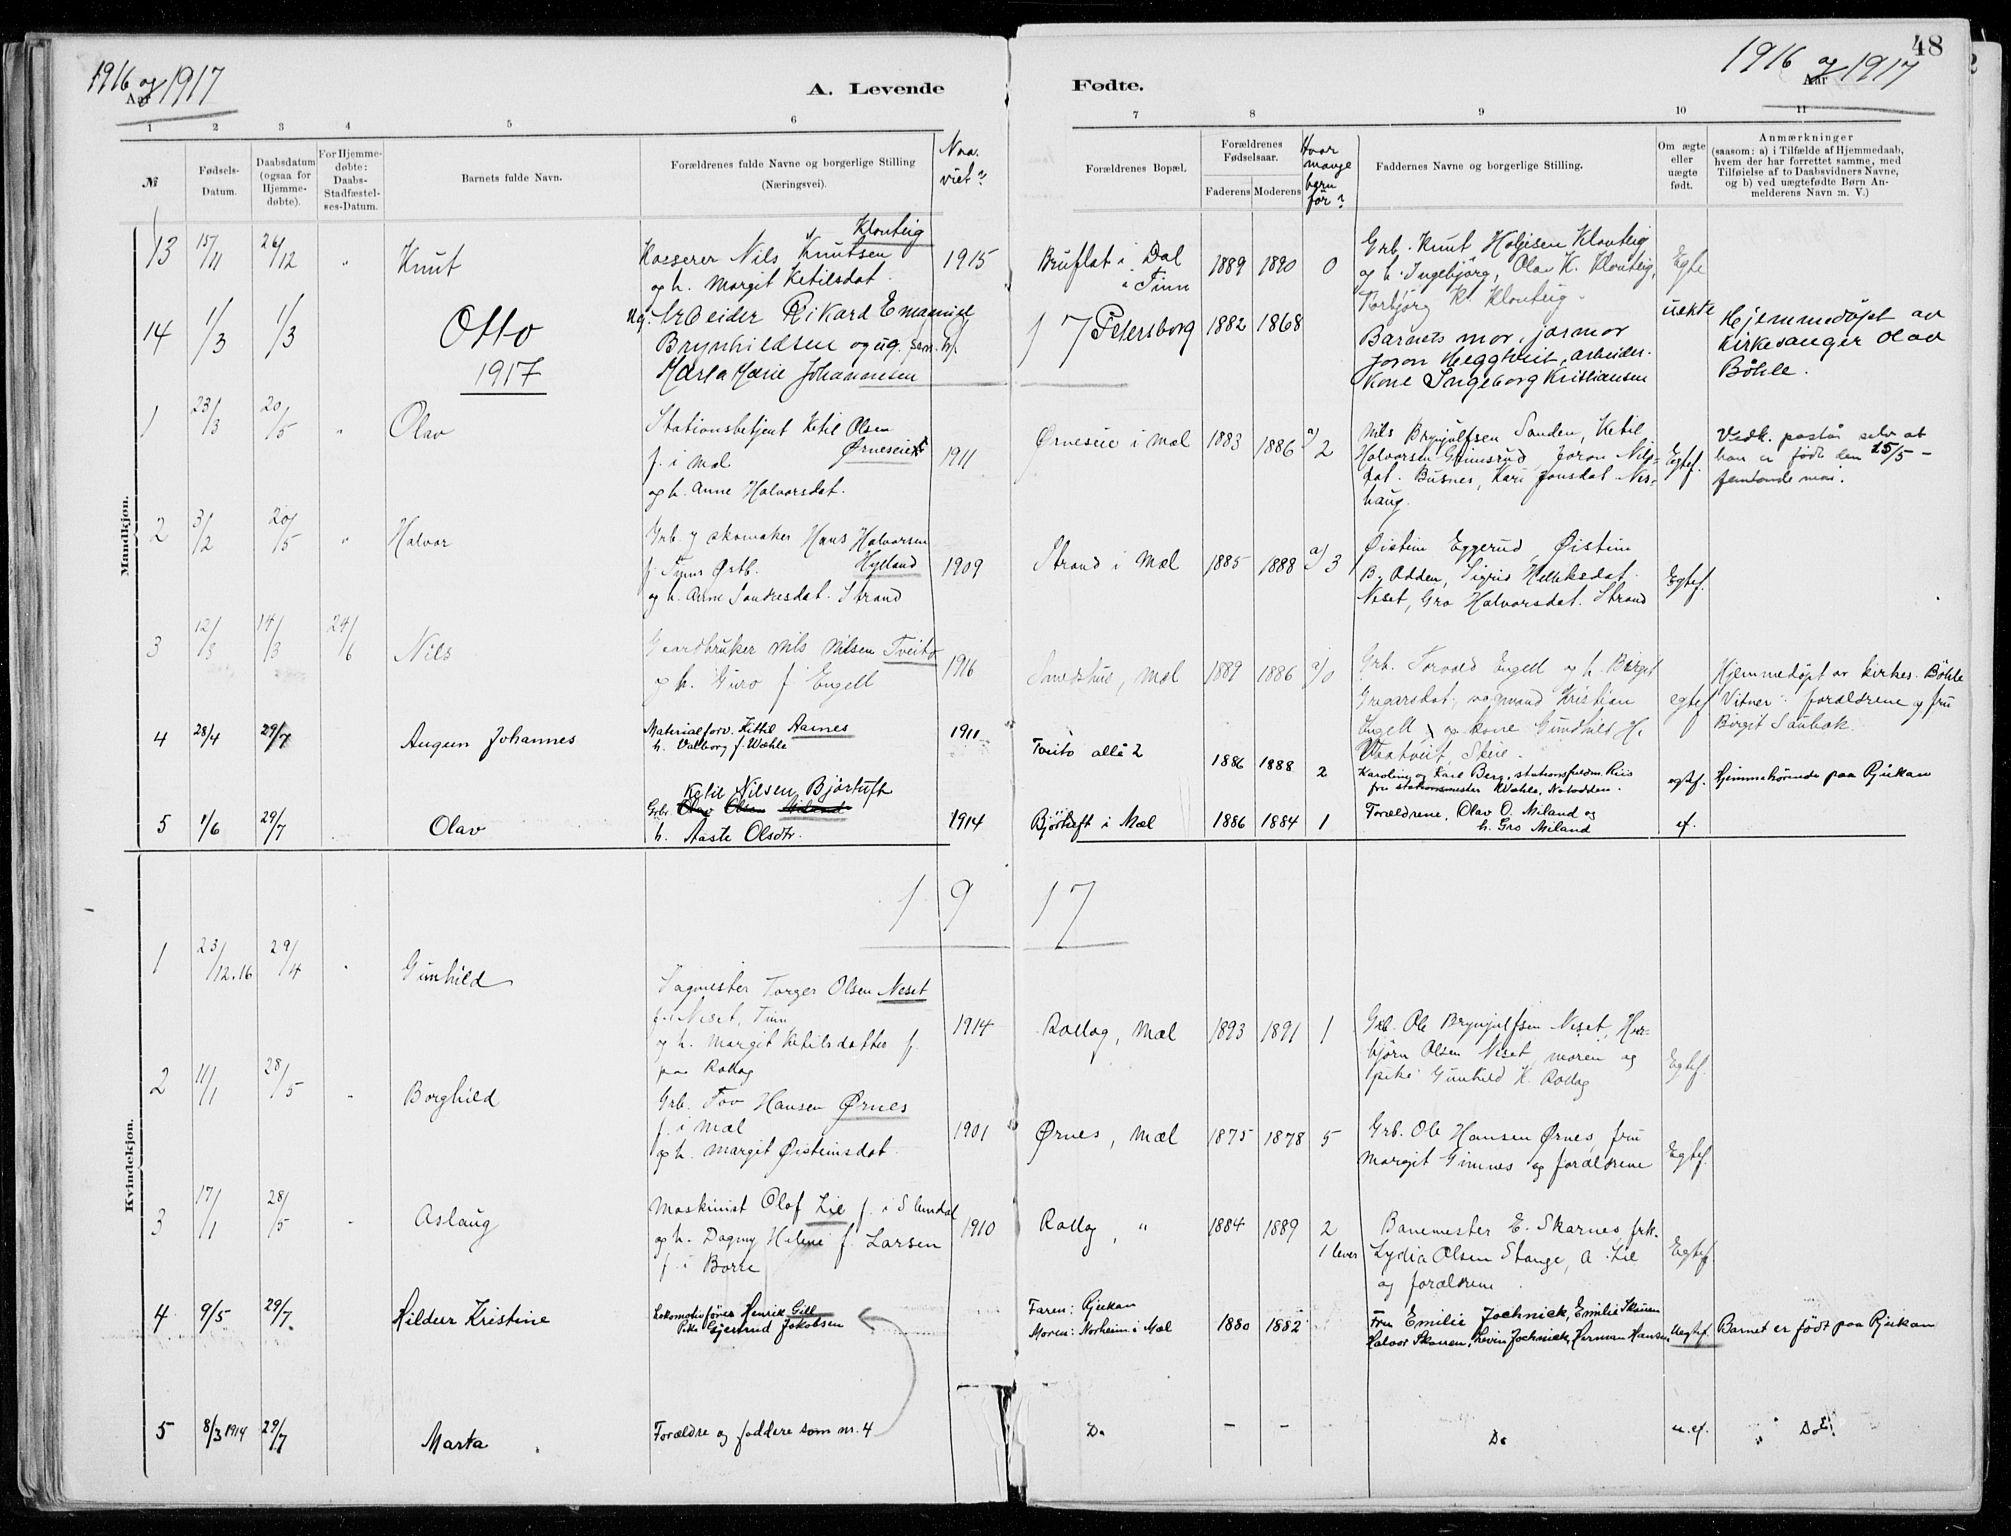 SAKO, Tinn kirkebøker, F/Fb/L0002: Ministerialbok nr. II 2, 1878-1917, s. 48